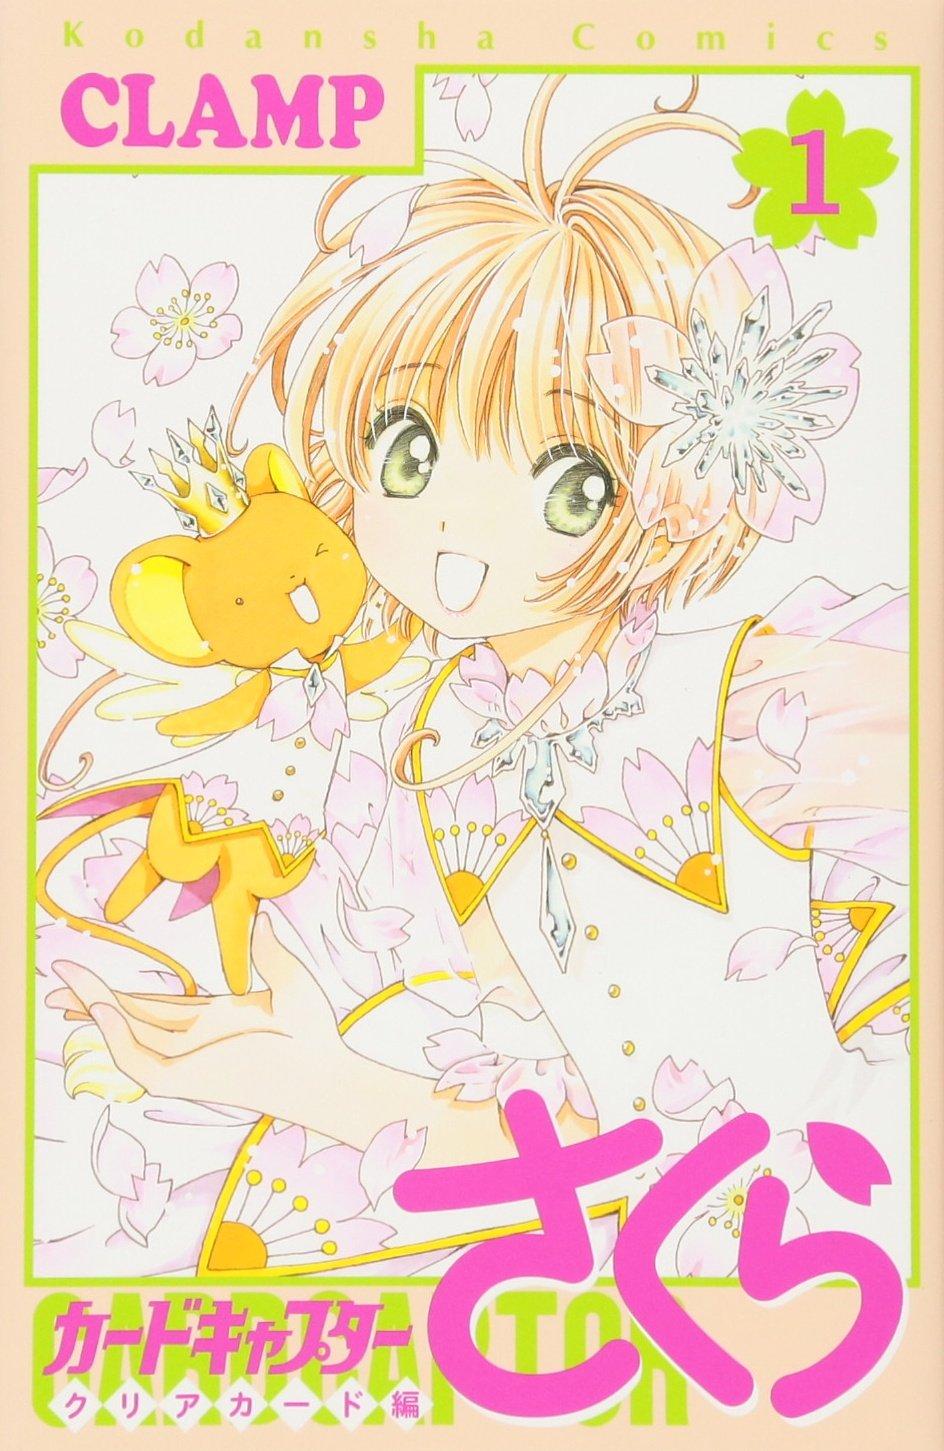 [CLAMP] Card Captor Sakura et autres mangas - Page 19 71sgrJig1KL